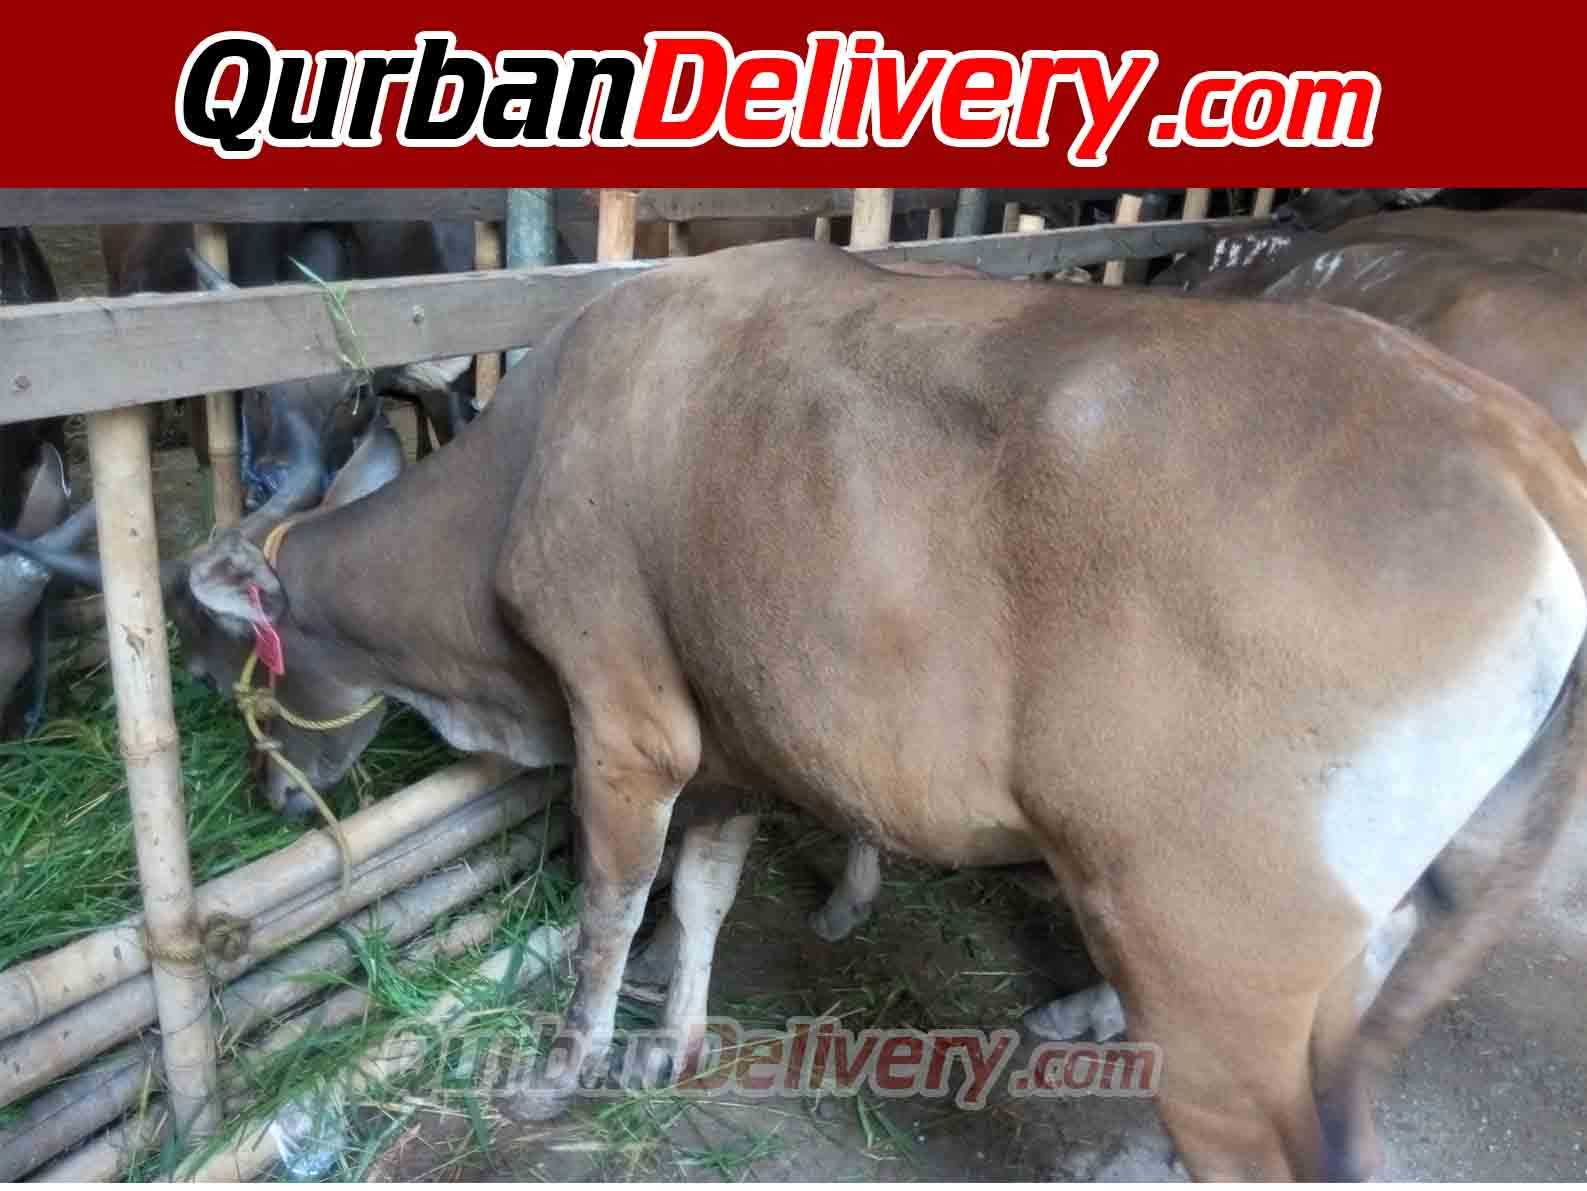 Jual Sapi Bali Qurban Murah Prediksi 2020-Qurban Delivery